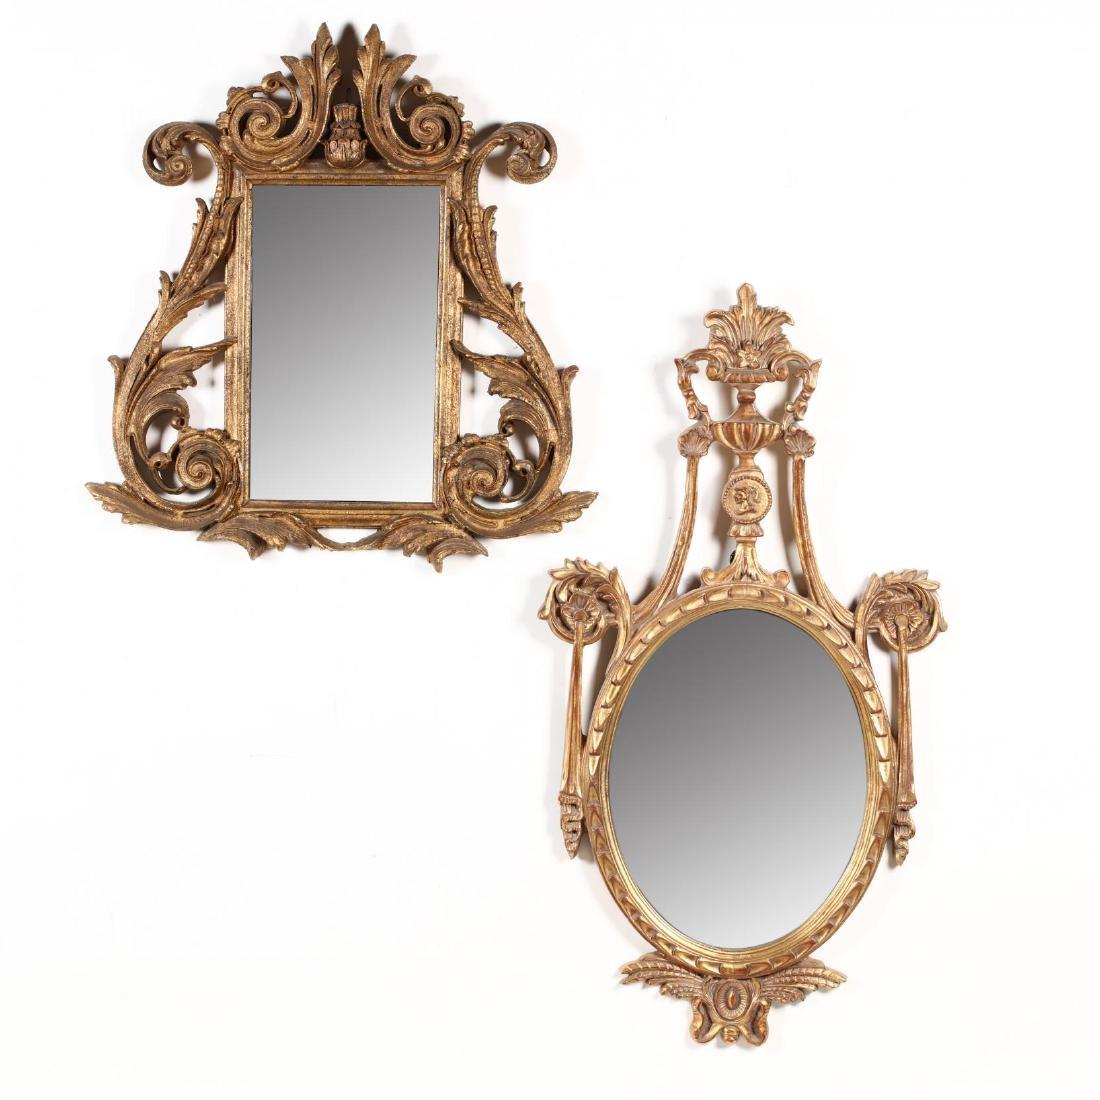 Two Decorative Continental Gilt Mirrors